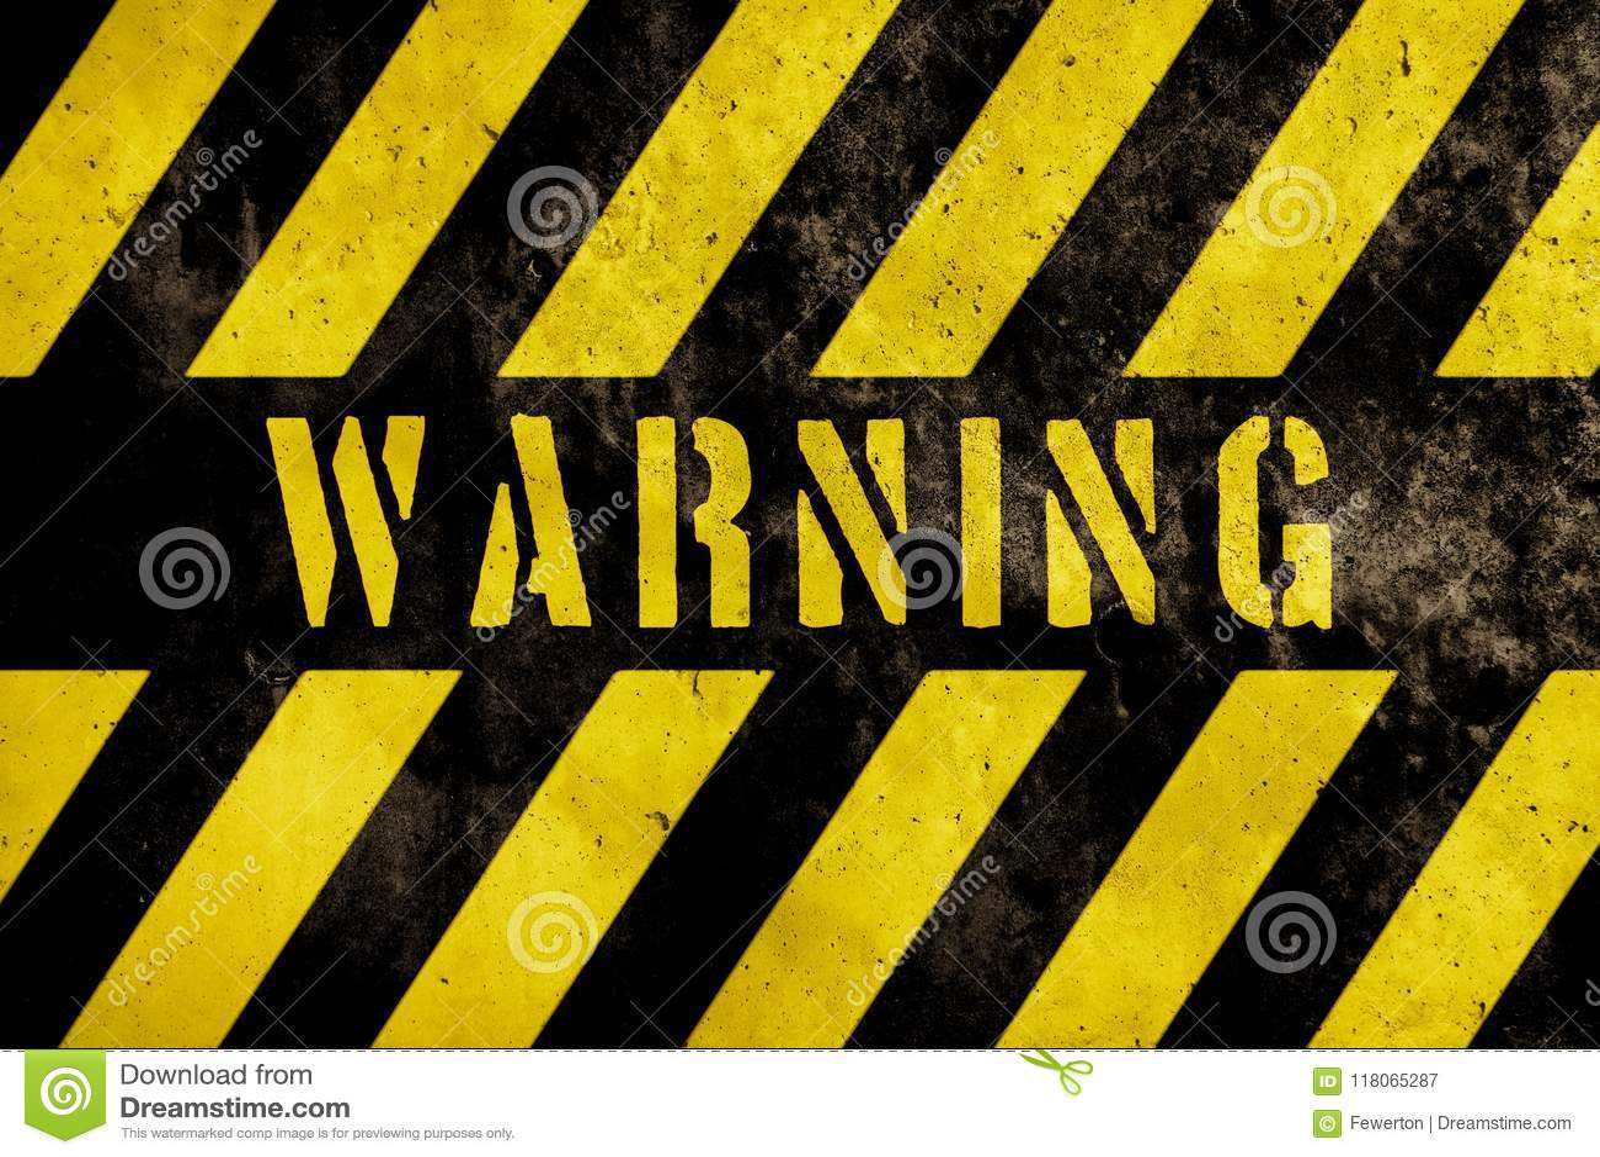 Texto do sinal de aviso com as listras amarelas e escuras pintadas sobre o fundo da textura da fachada do muro de cimento